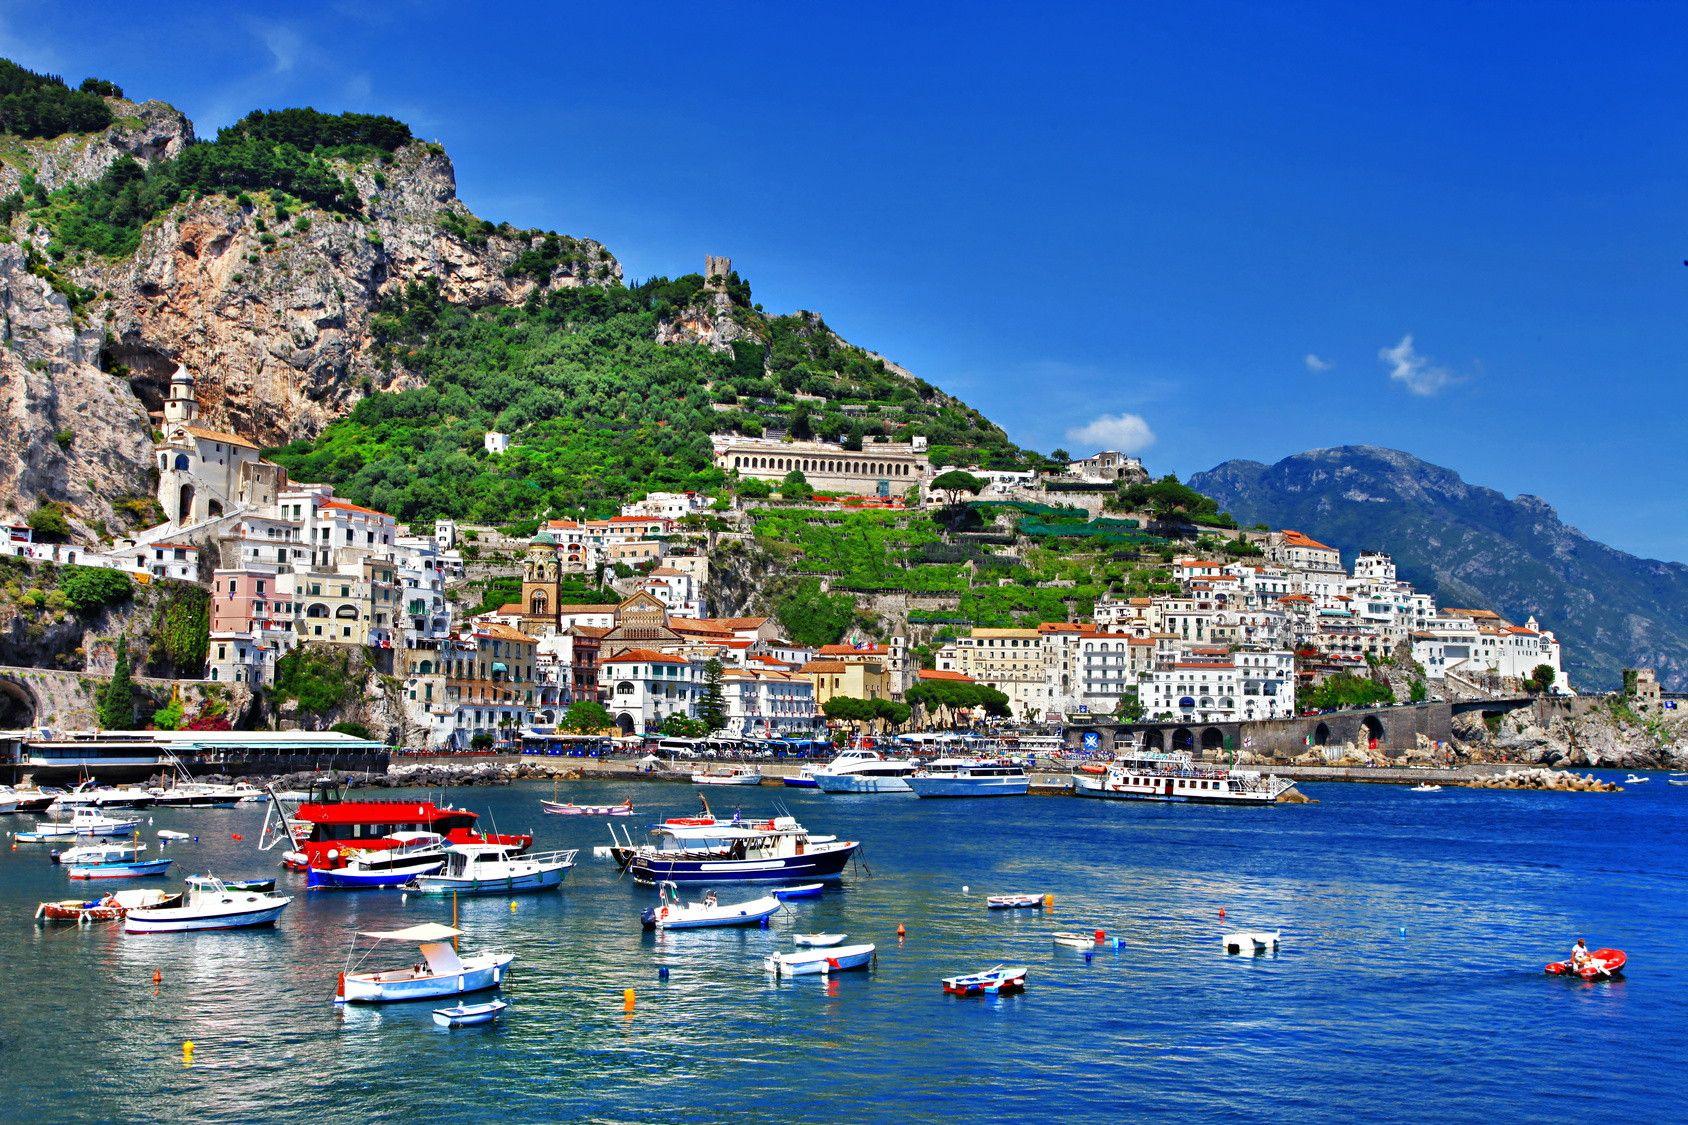 Cote D Azur Kuste Von Amalfi Amalfikuste Italien Positano Italien